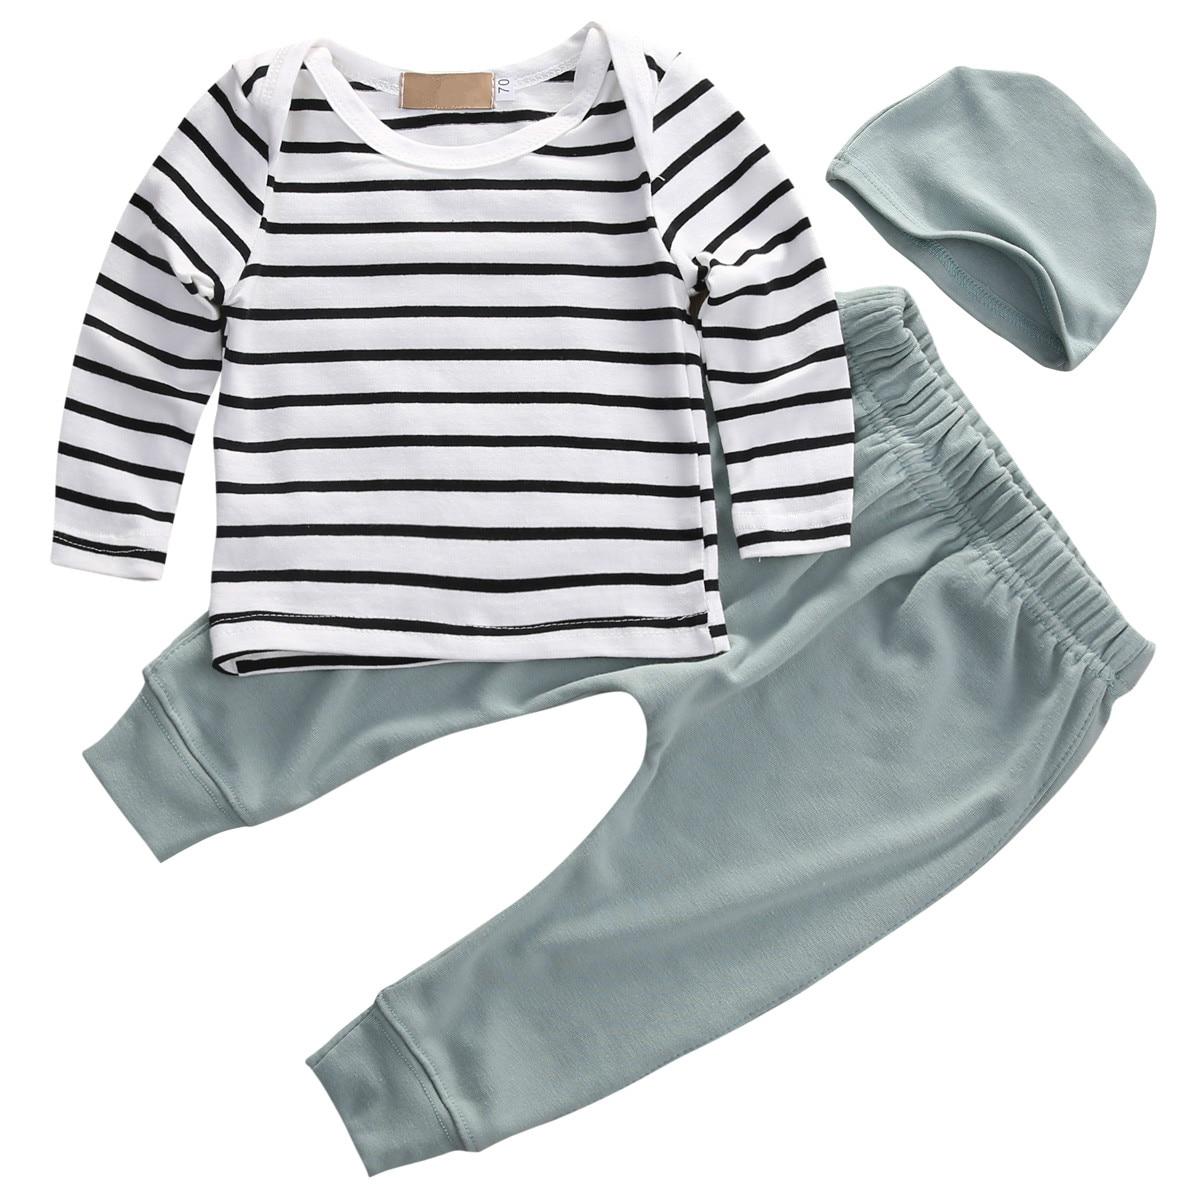 New Fashion Newborn Toddler Kids Baby Boys Girls Outfits Clothes Long Sleeve Striped T-shirt Tops+Pants 3PCS Cute Bbay Kids Set